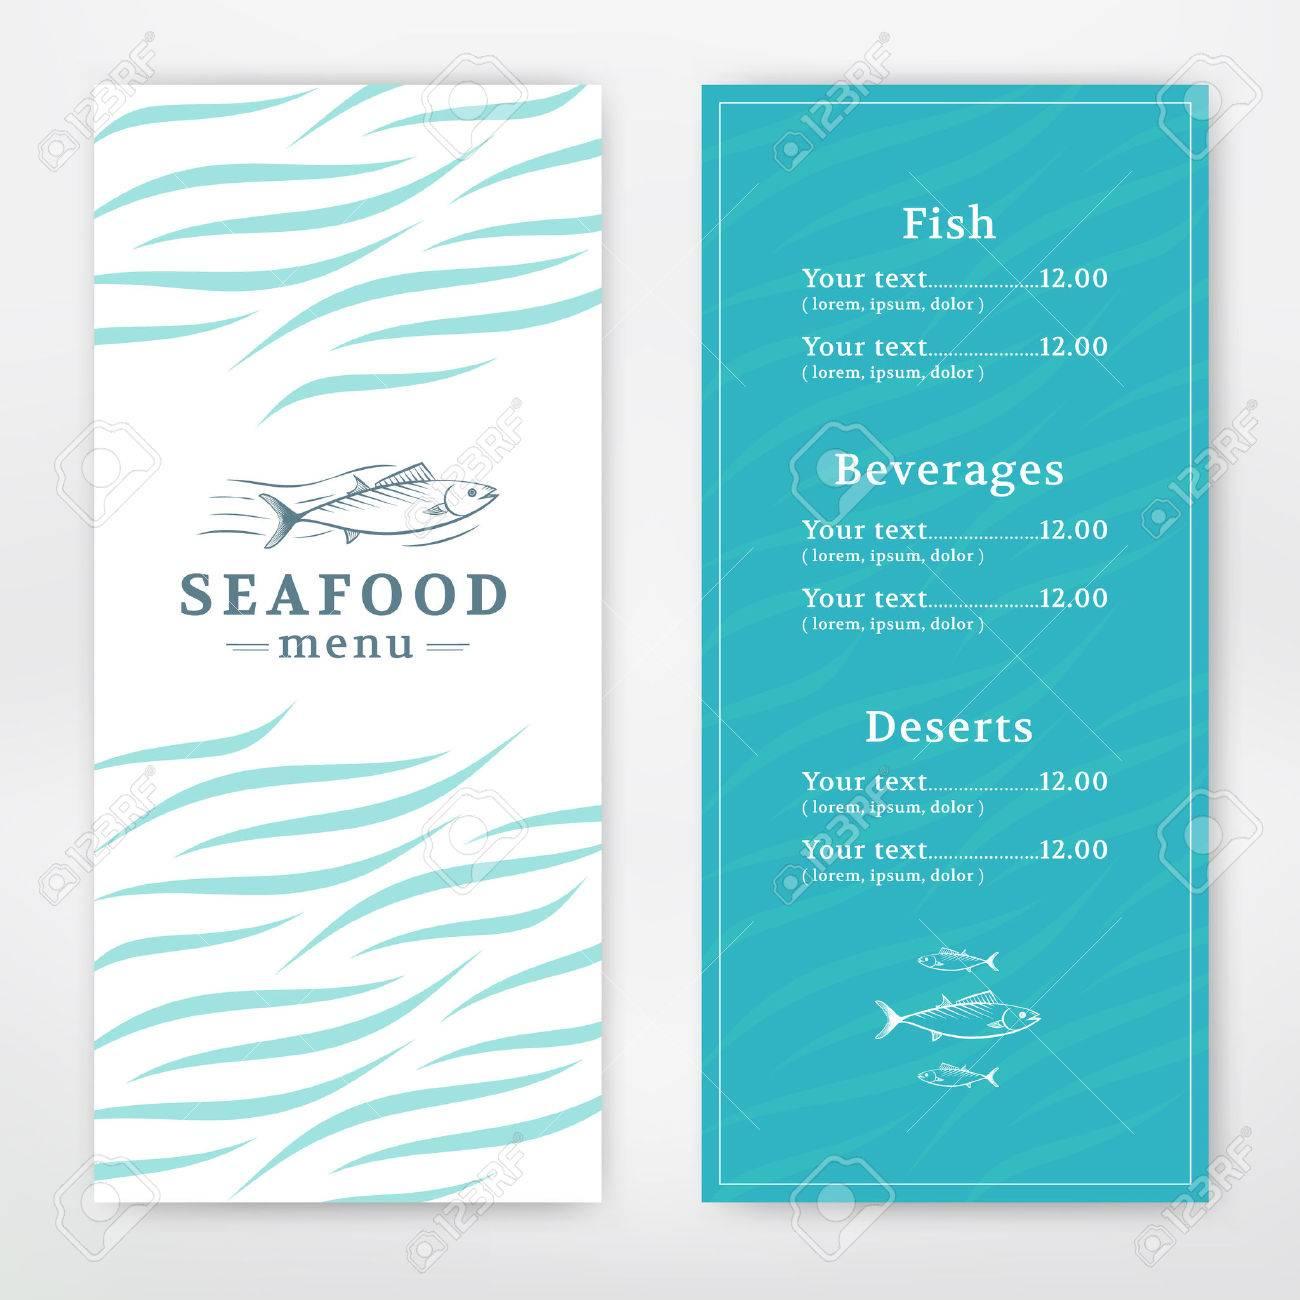 Seafood menu design for restaurant or cafe. Vector template - 45352880